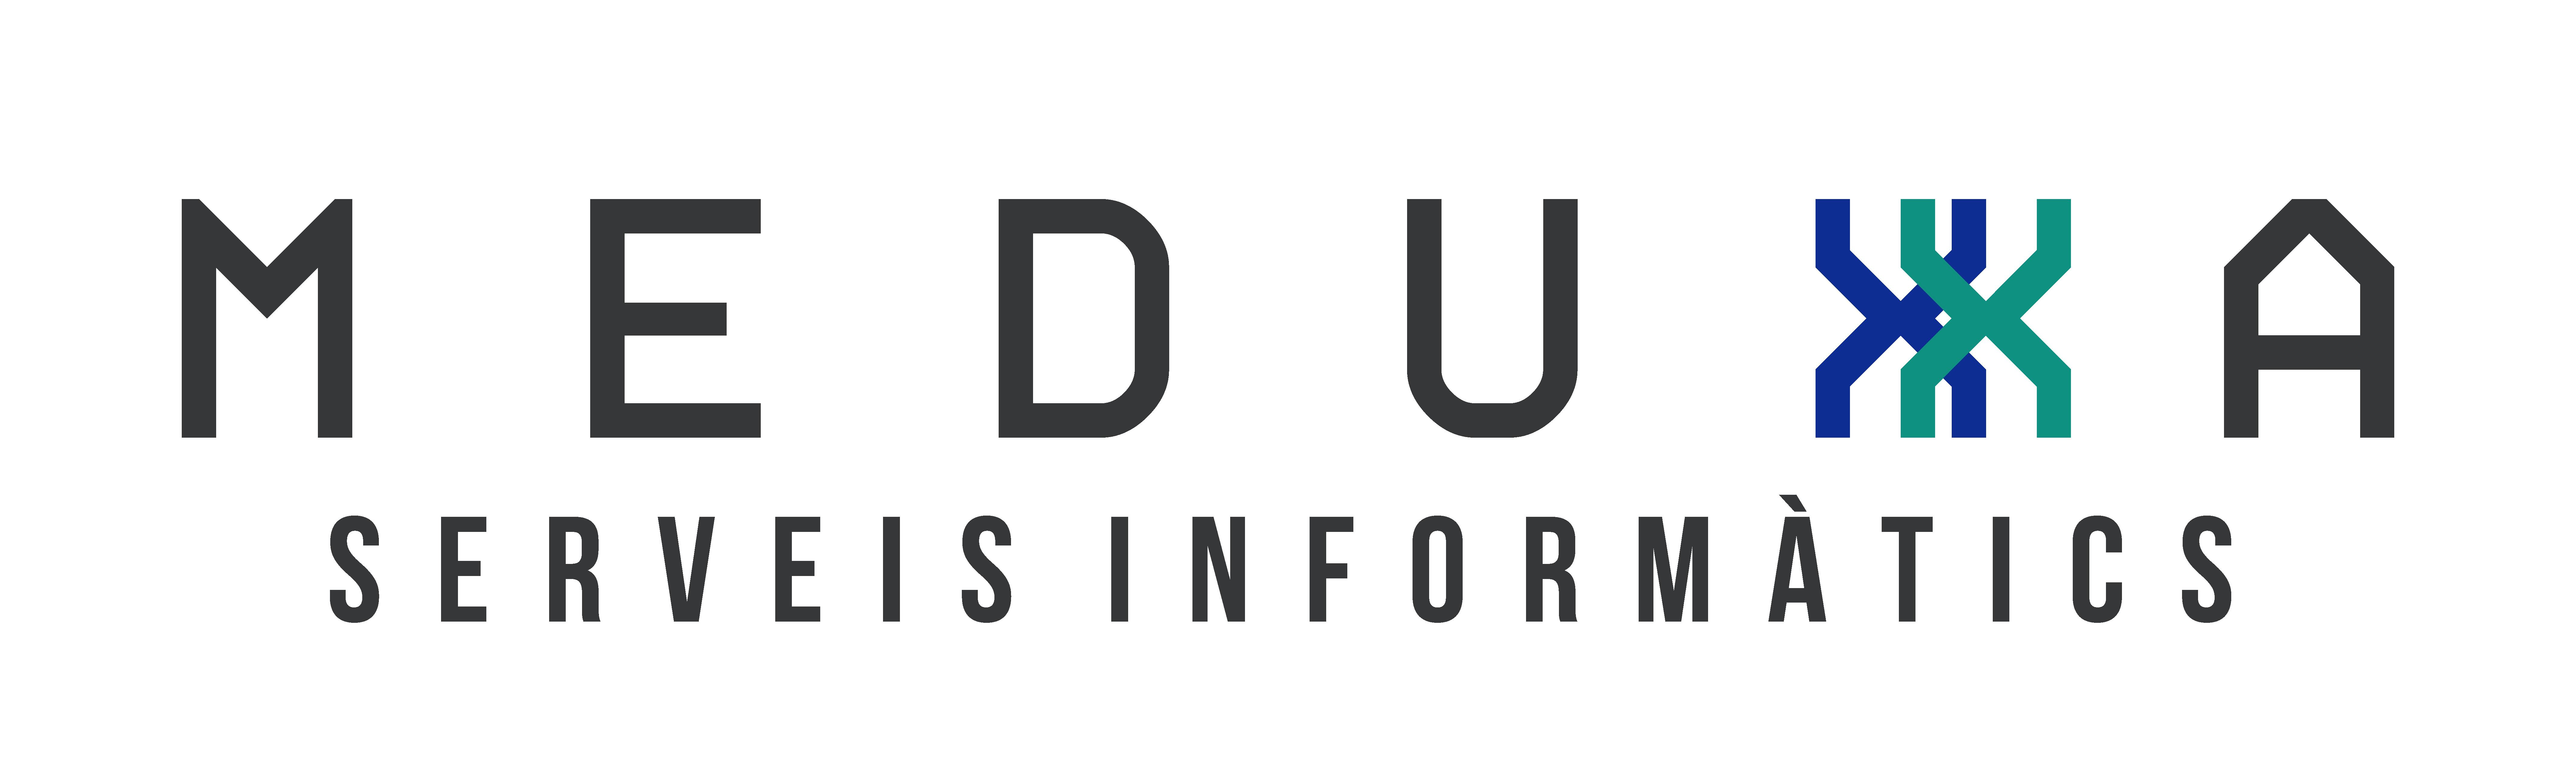 Meduxa Servicios Informáticos